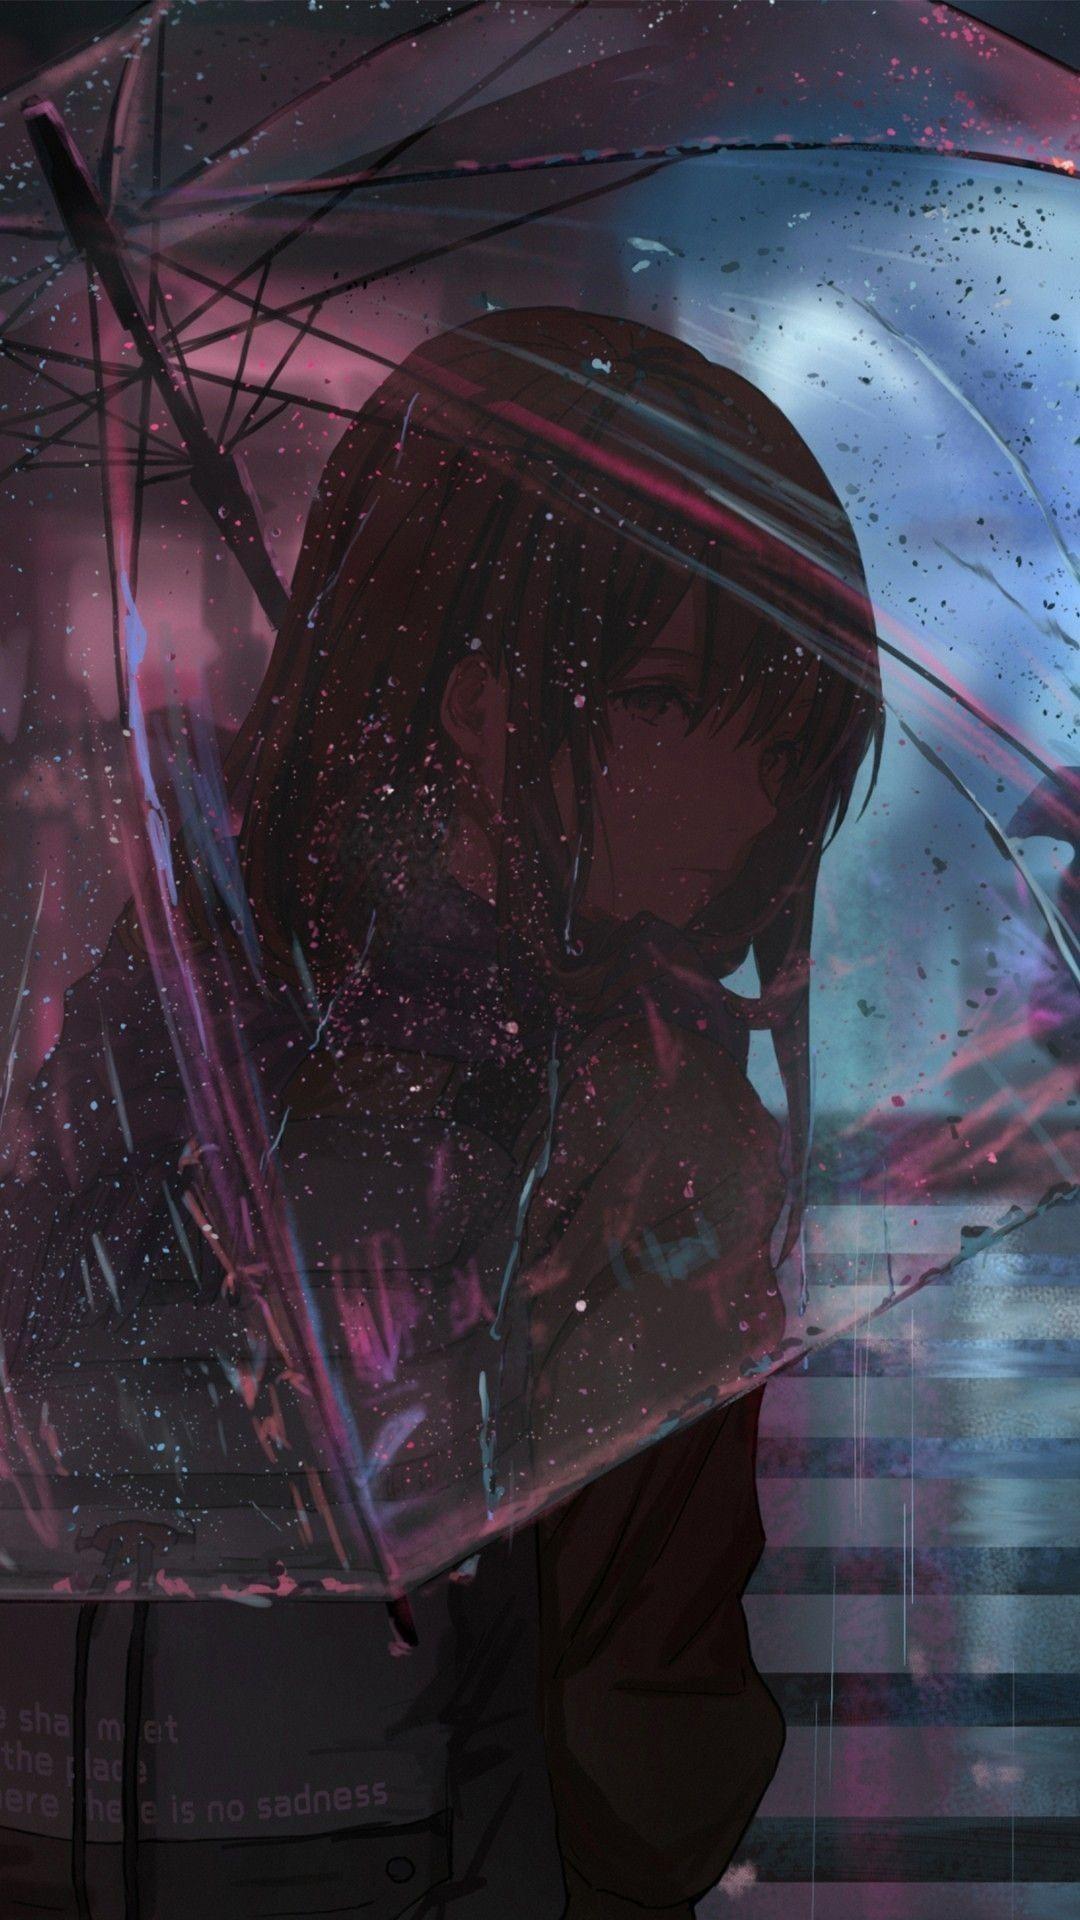 Anime Wallpapers Hd Anime Wallpaper In 2020 Anime Wallpaper 1920x1080 Anime Scenery Anime Art Girl